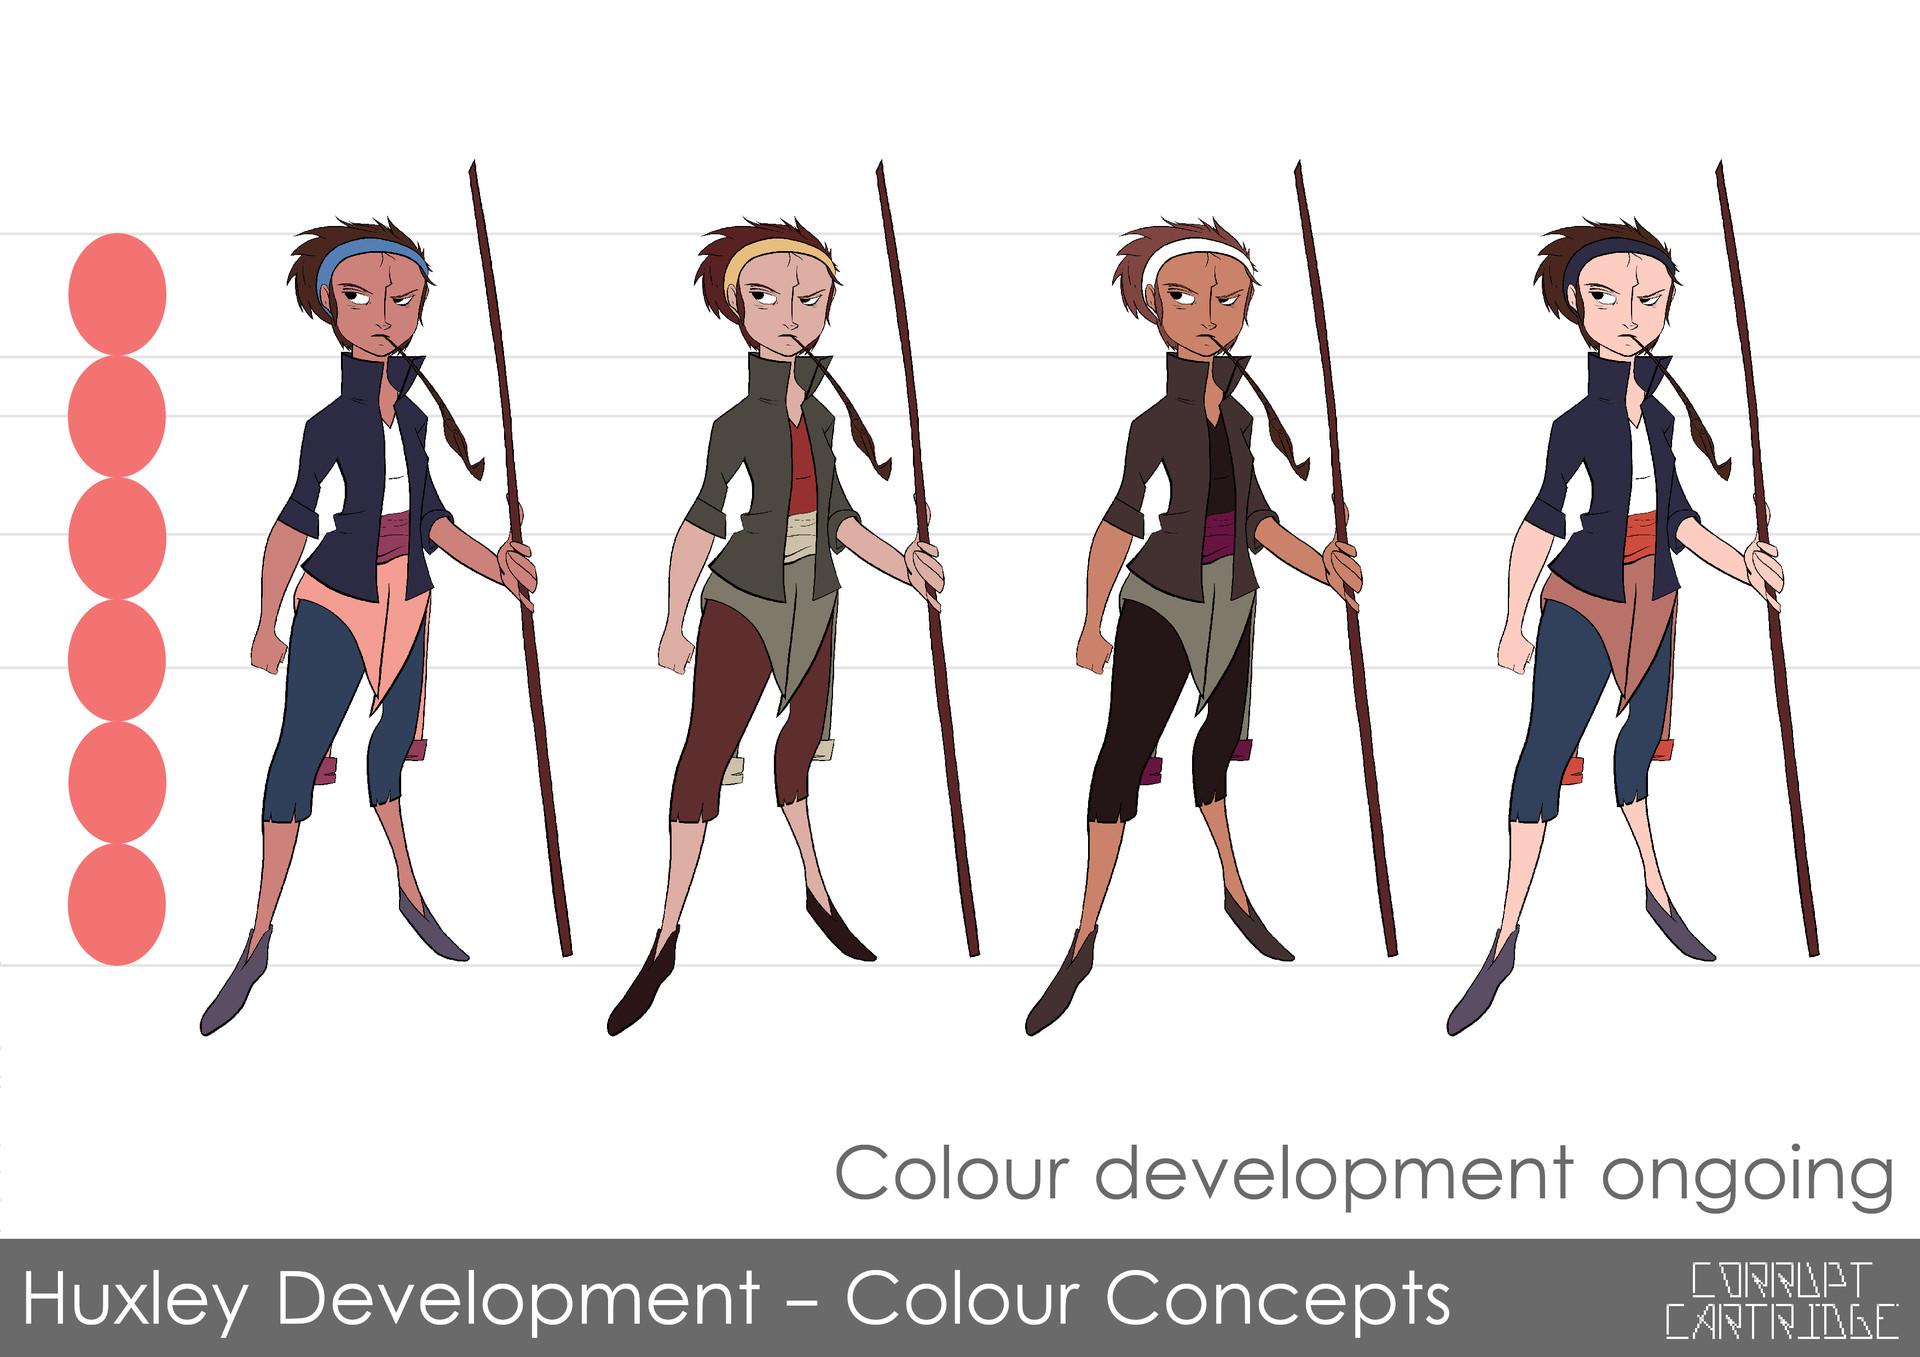 Craig mullins 09 huxley colour concepts 02